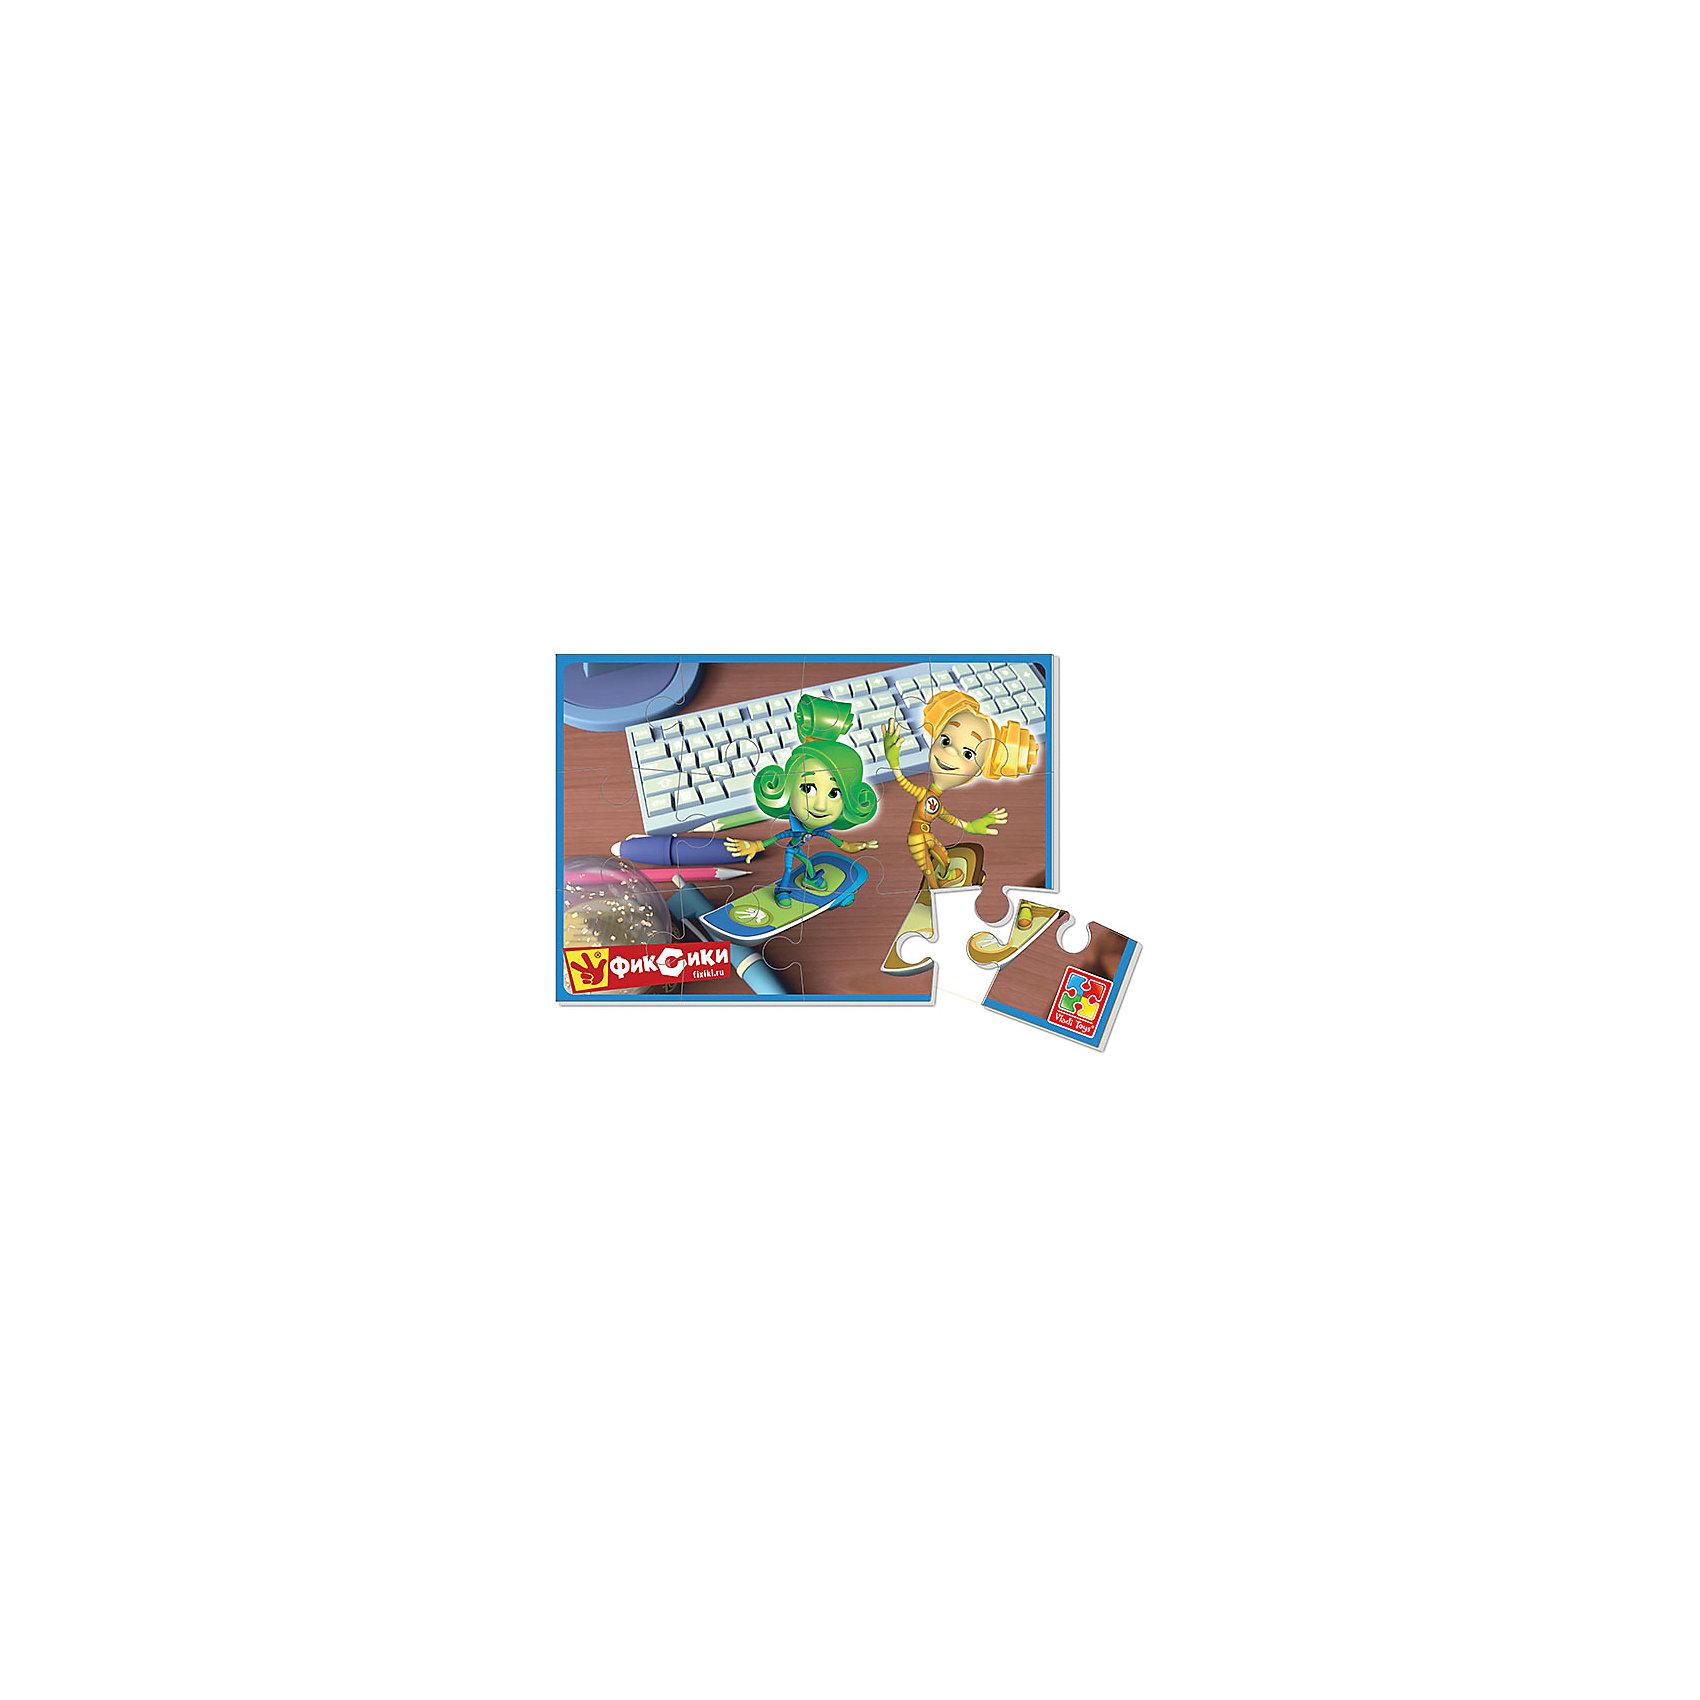 Vladi Toys Мягкие пазлы А5 Фиксики, Vladi Toys пазлы origami пазлы 4 в 1 фиксики 12550